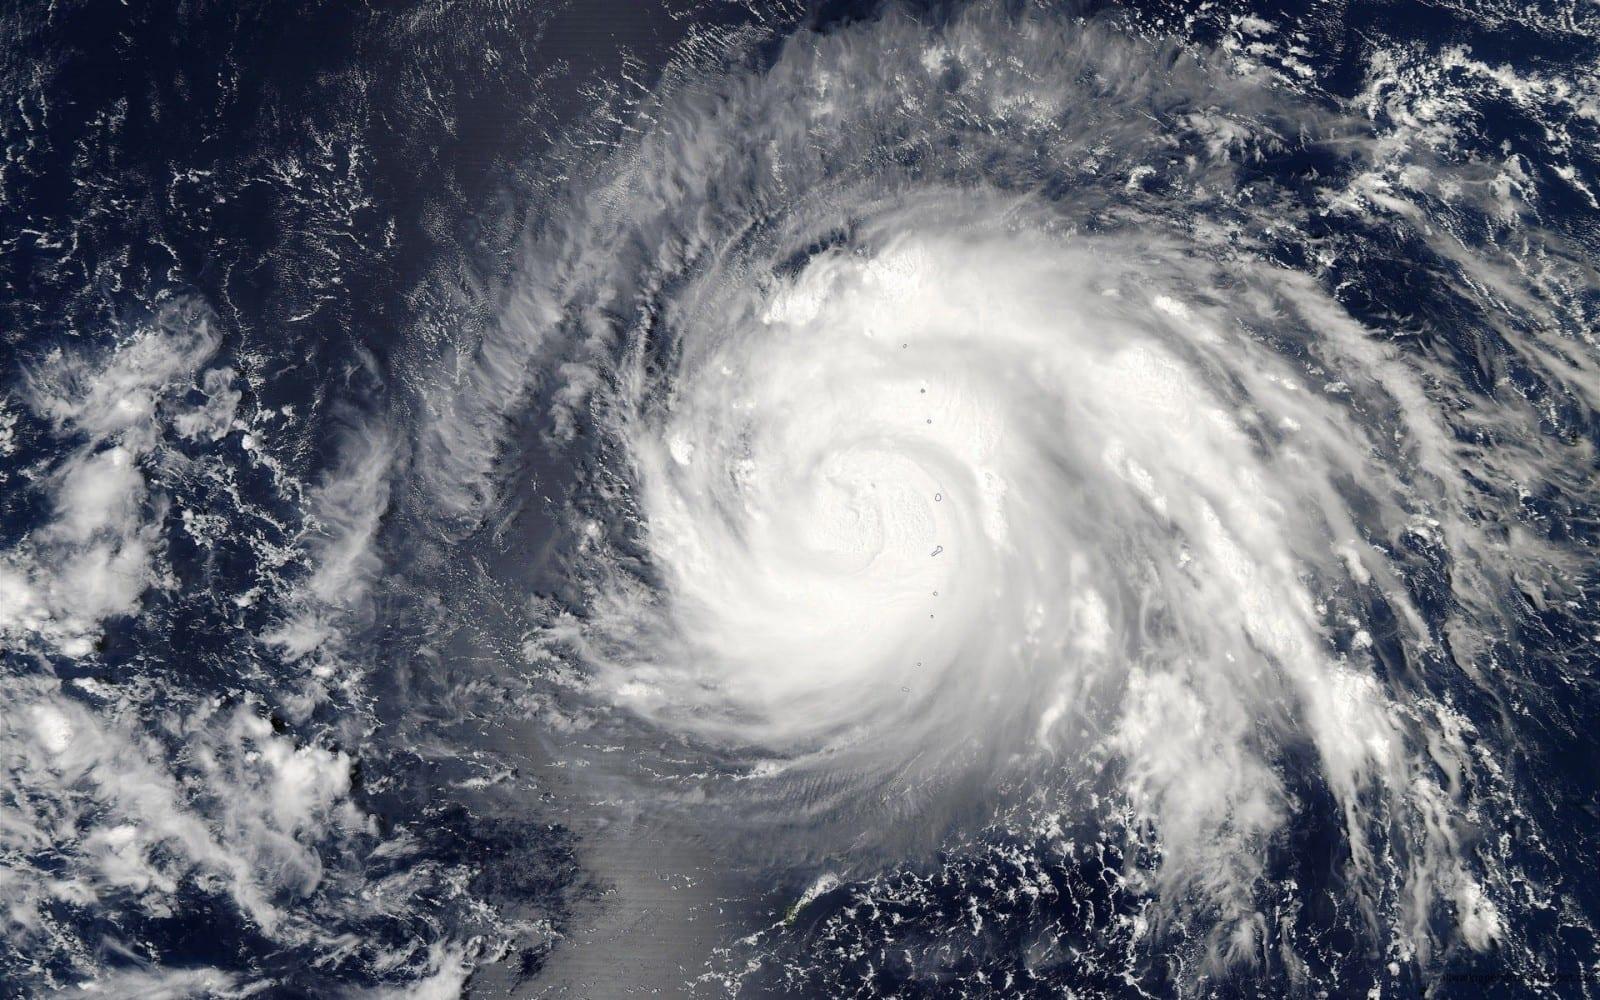 hurricane-Irma-from-space.jpg